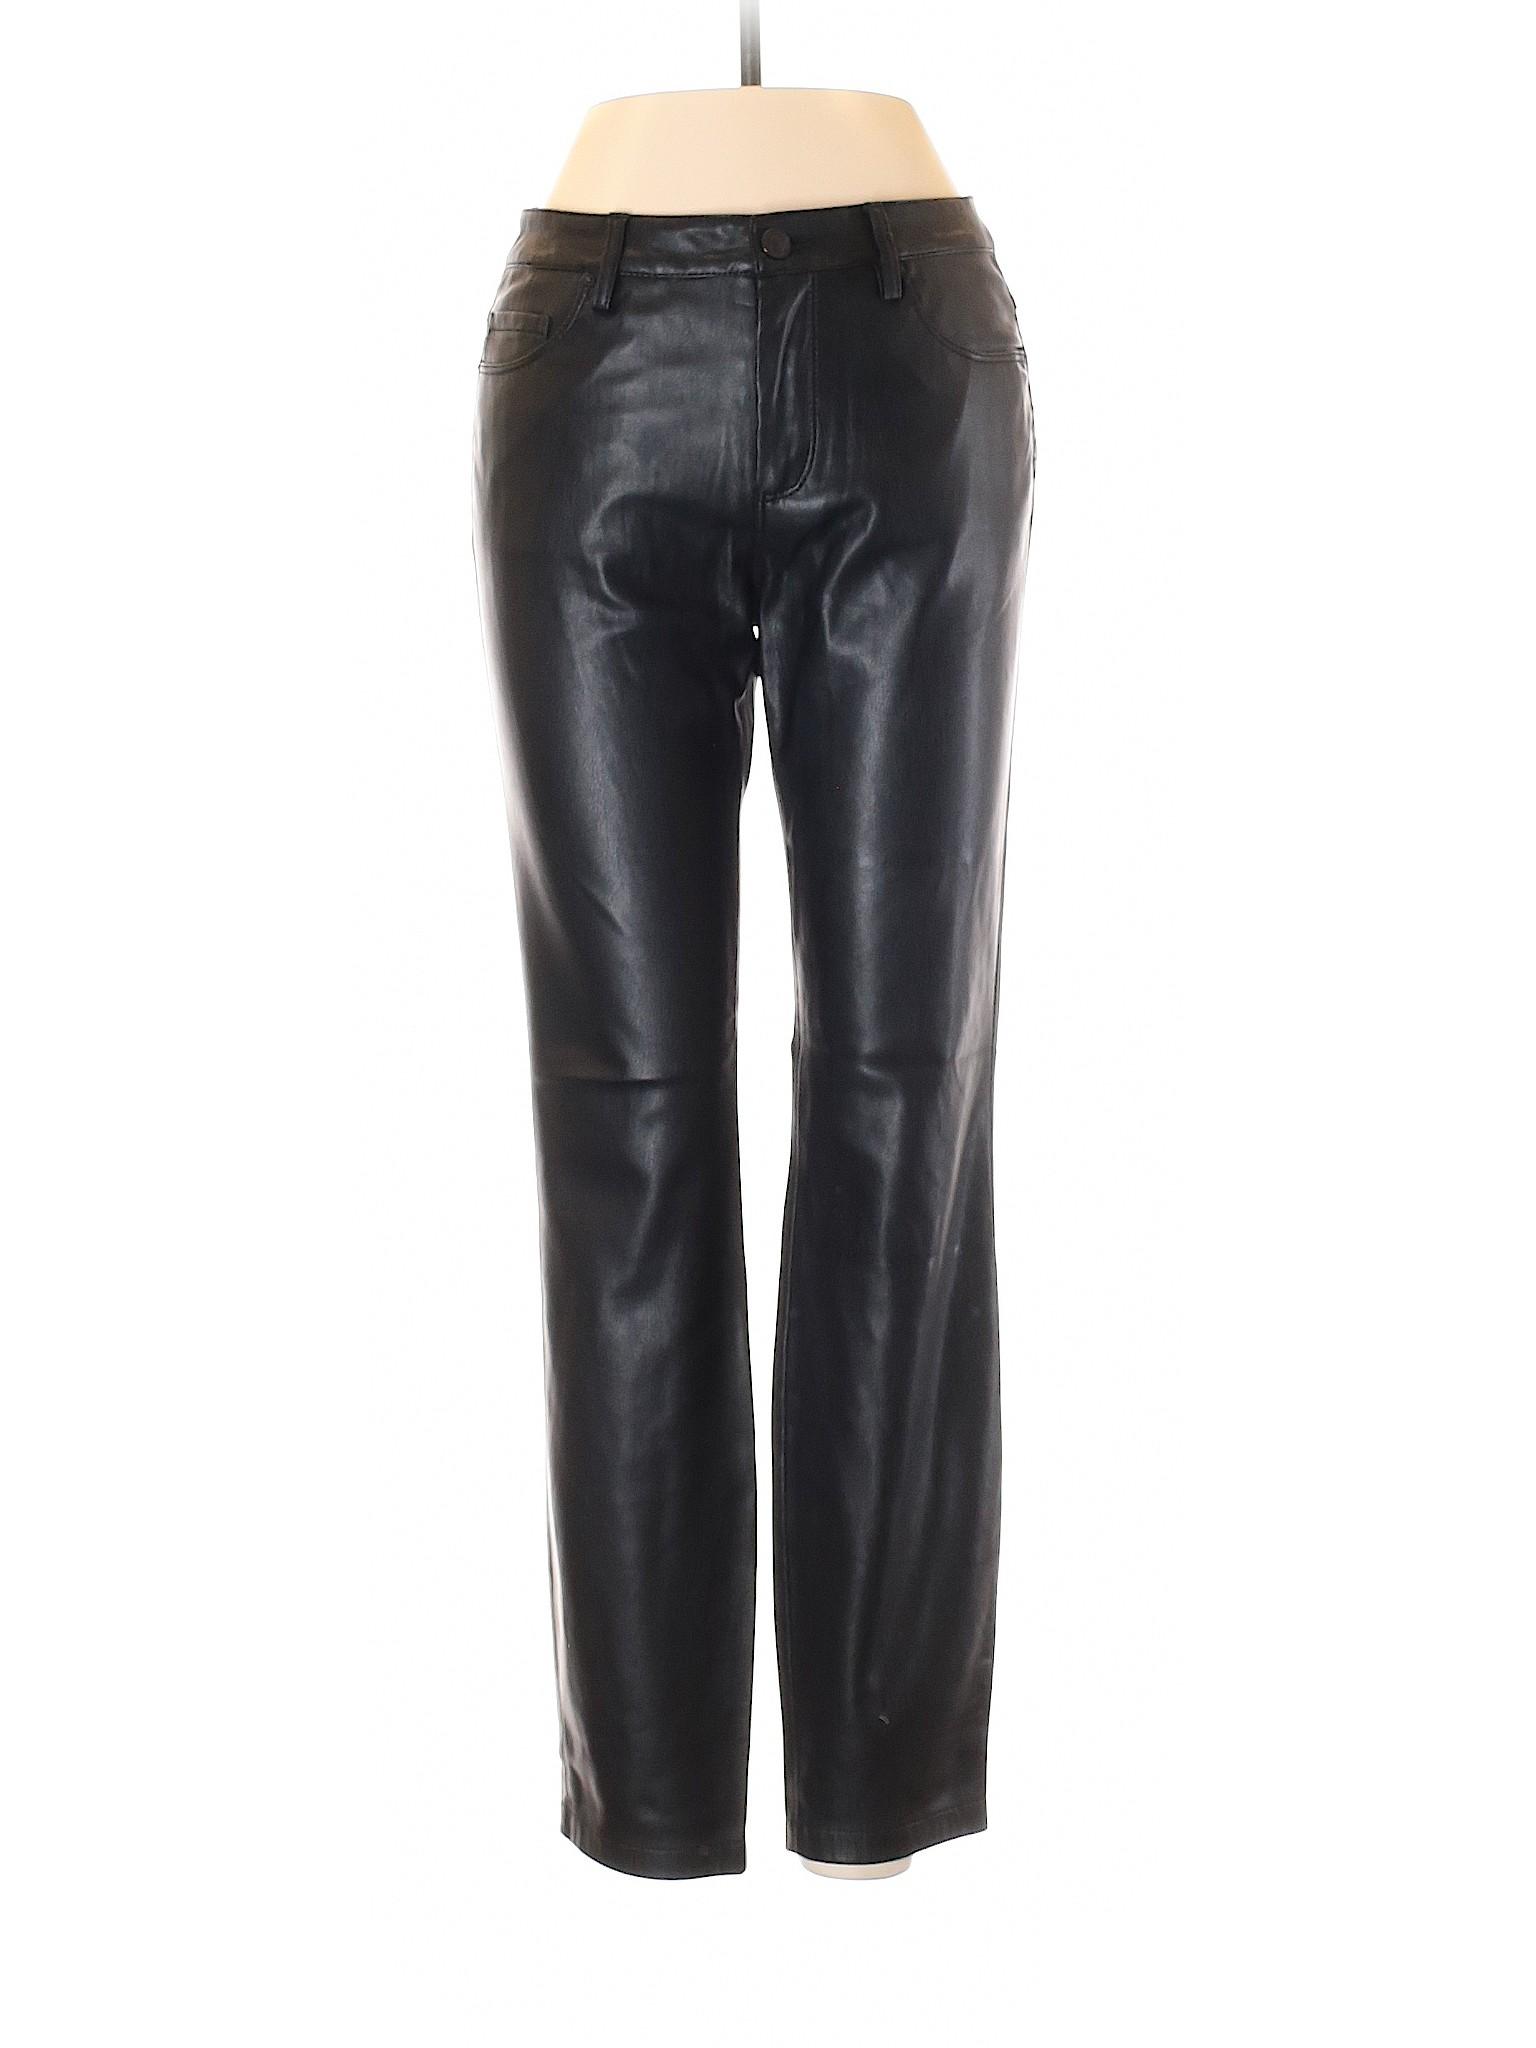 b5c3669e Details about Zara Women Black Faux Leather Pants S